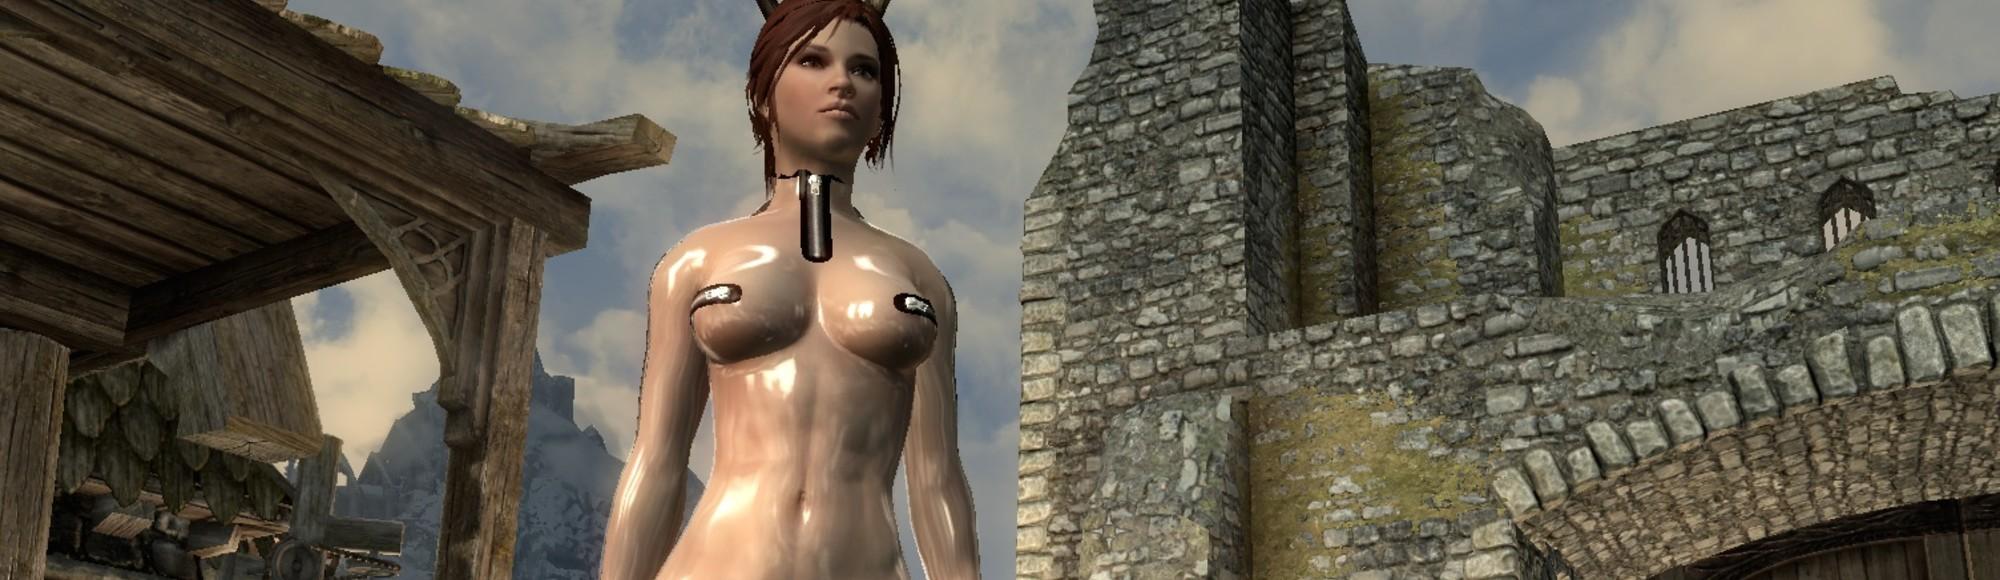 Erektion strand video hentay lesben kostenlos